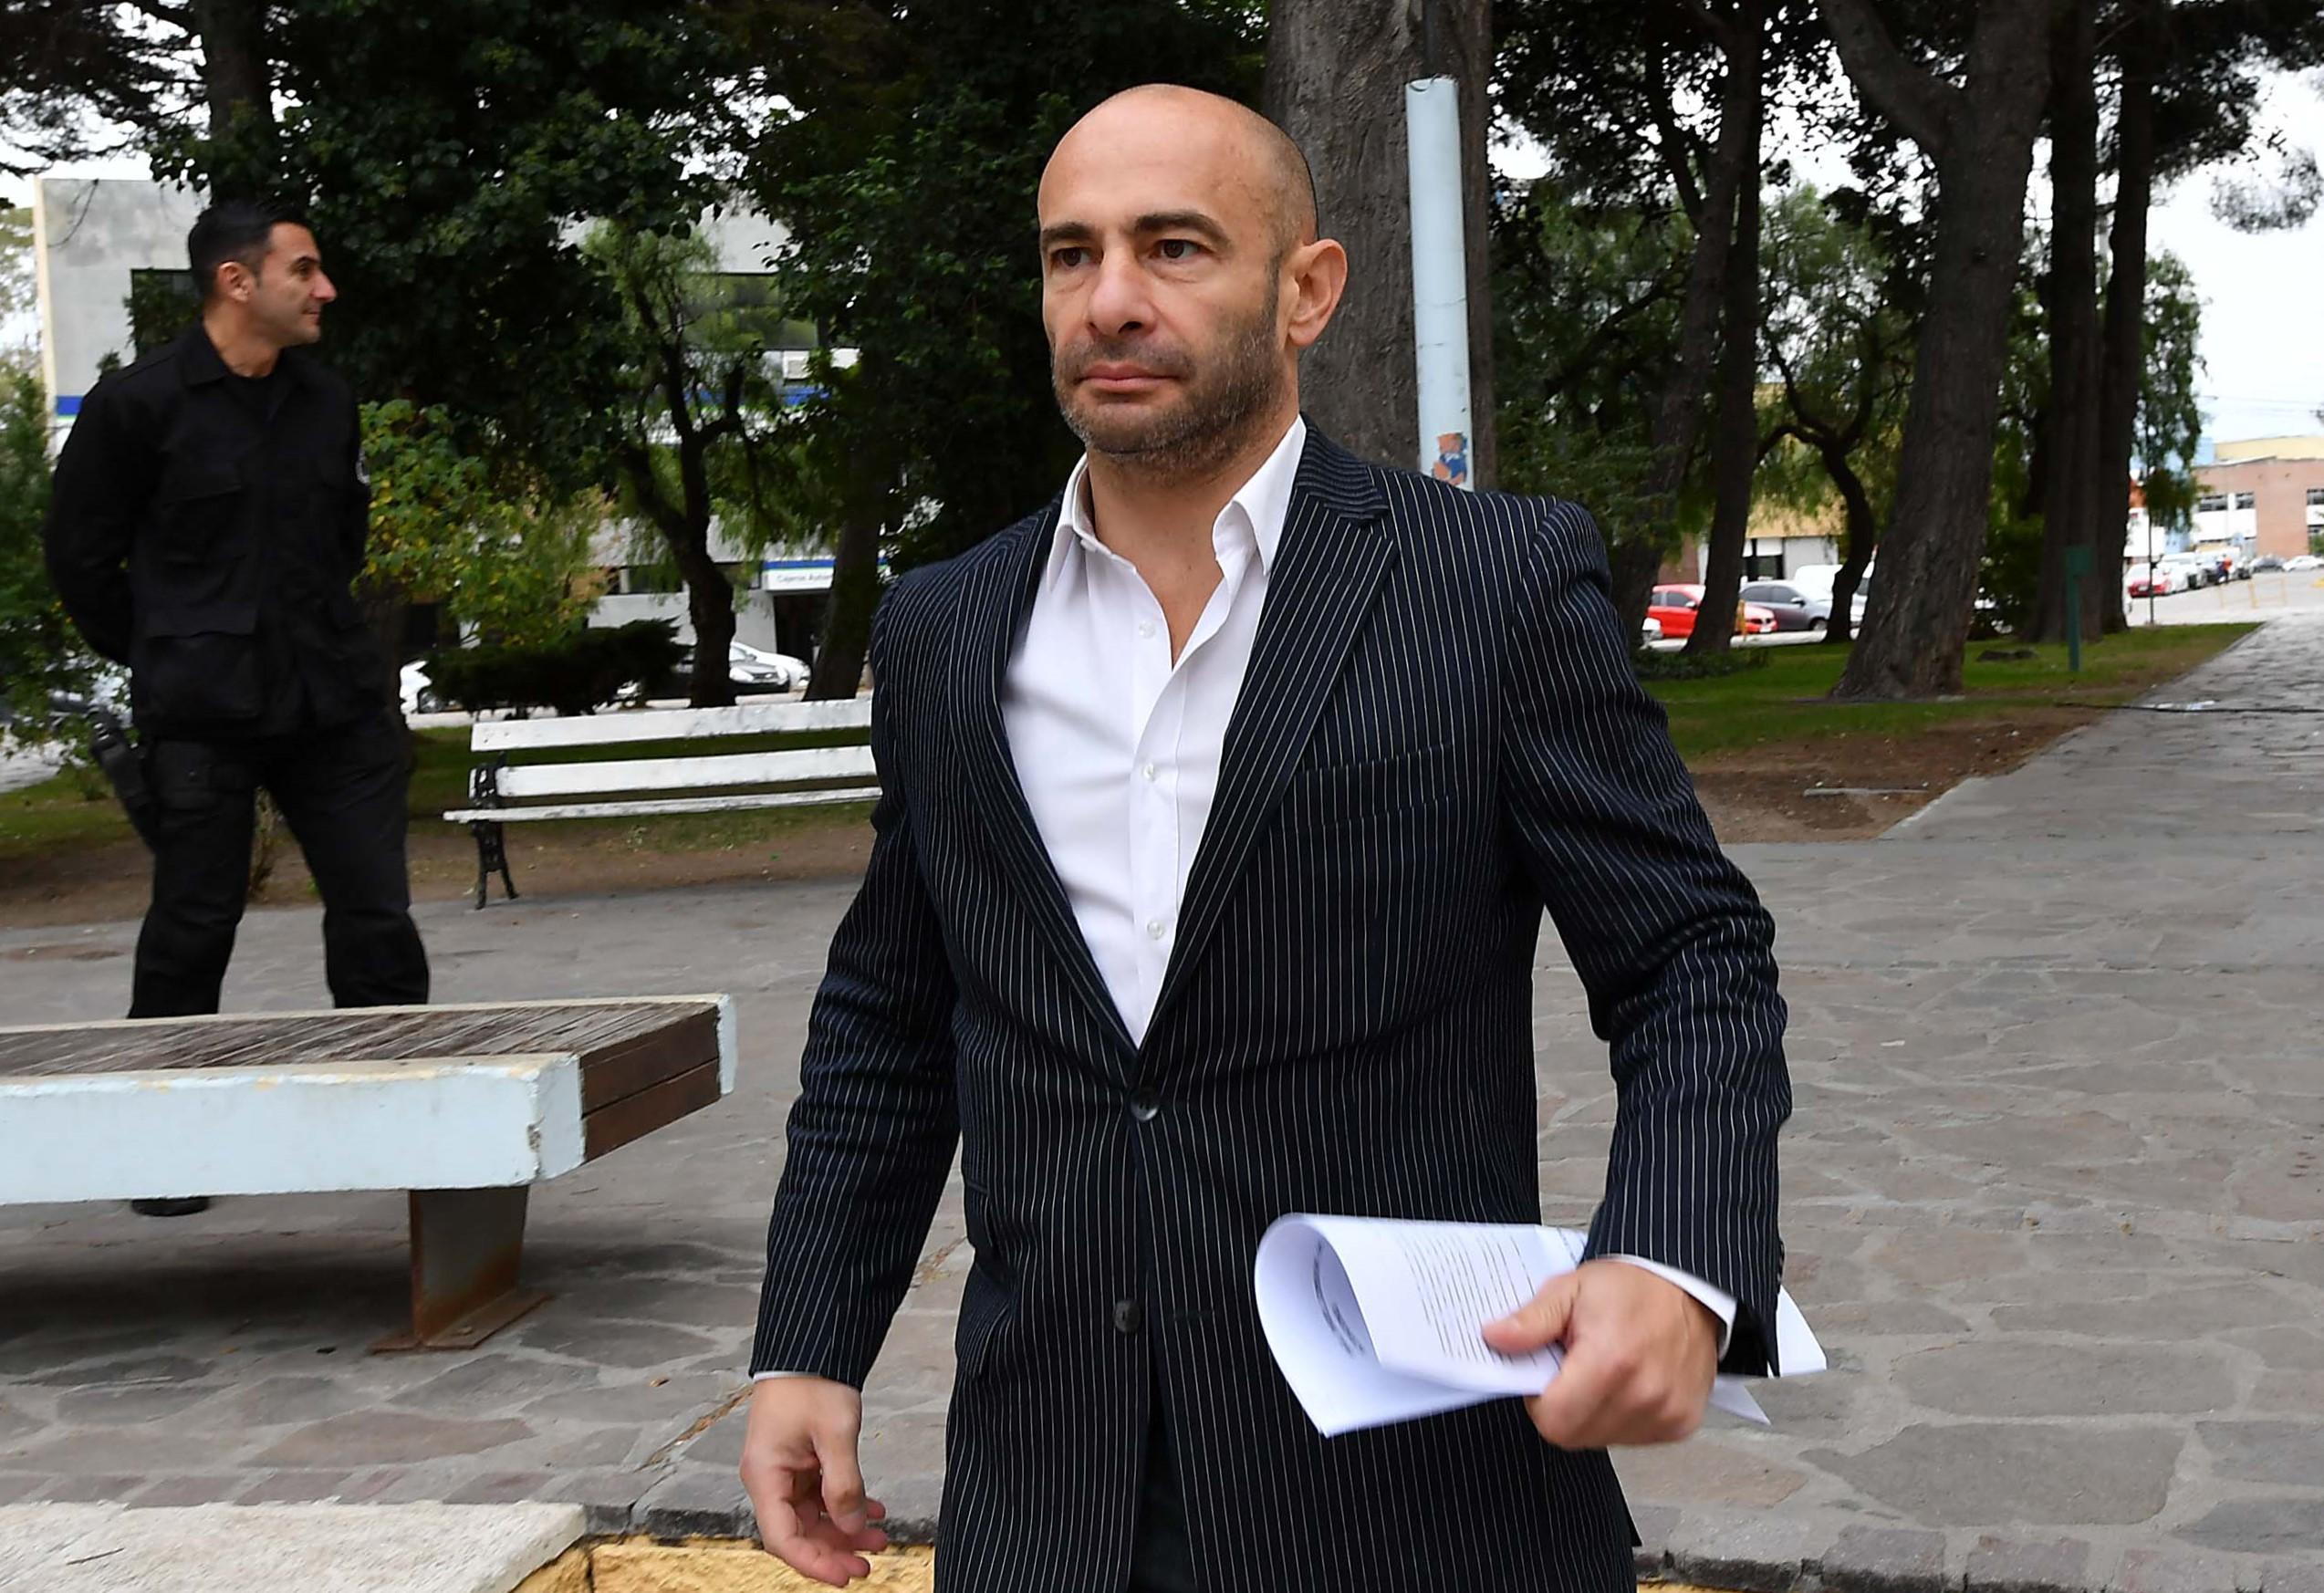 CASO TINO JOHN: LA LEGISLATURA DE CHUBUT PIDE INFORMES AL MINISTRO MASSONI